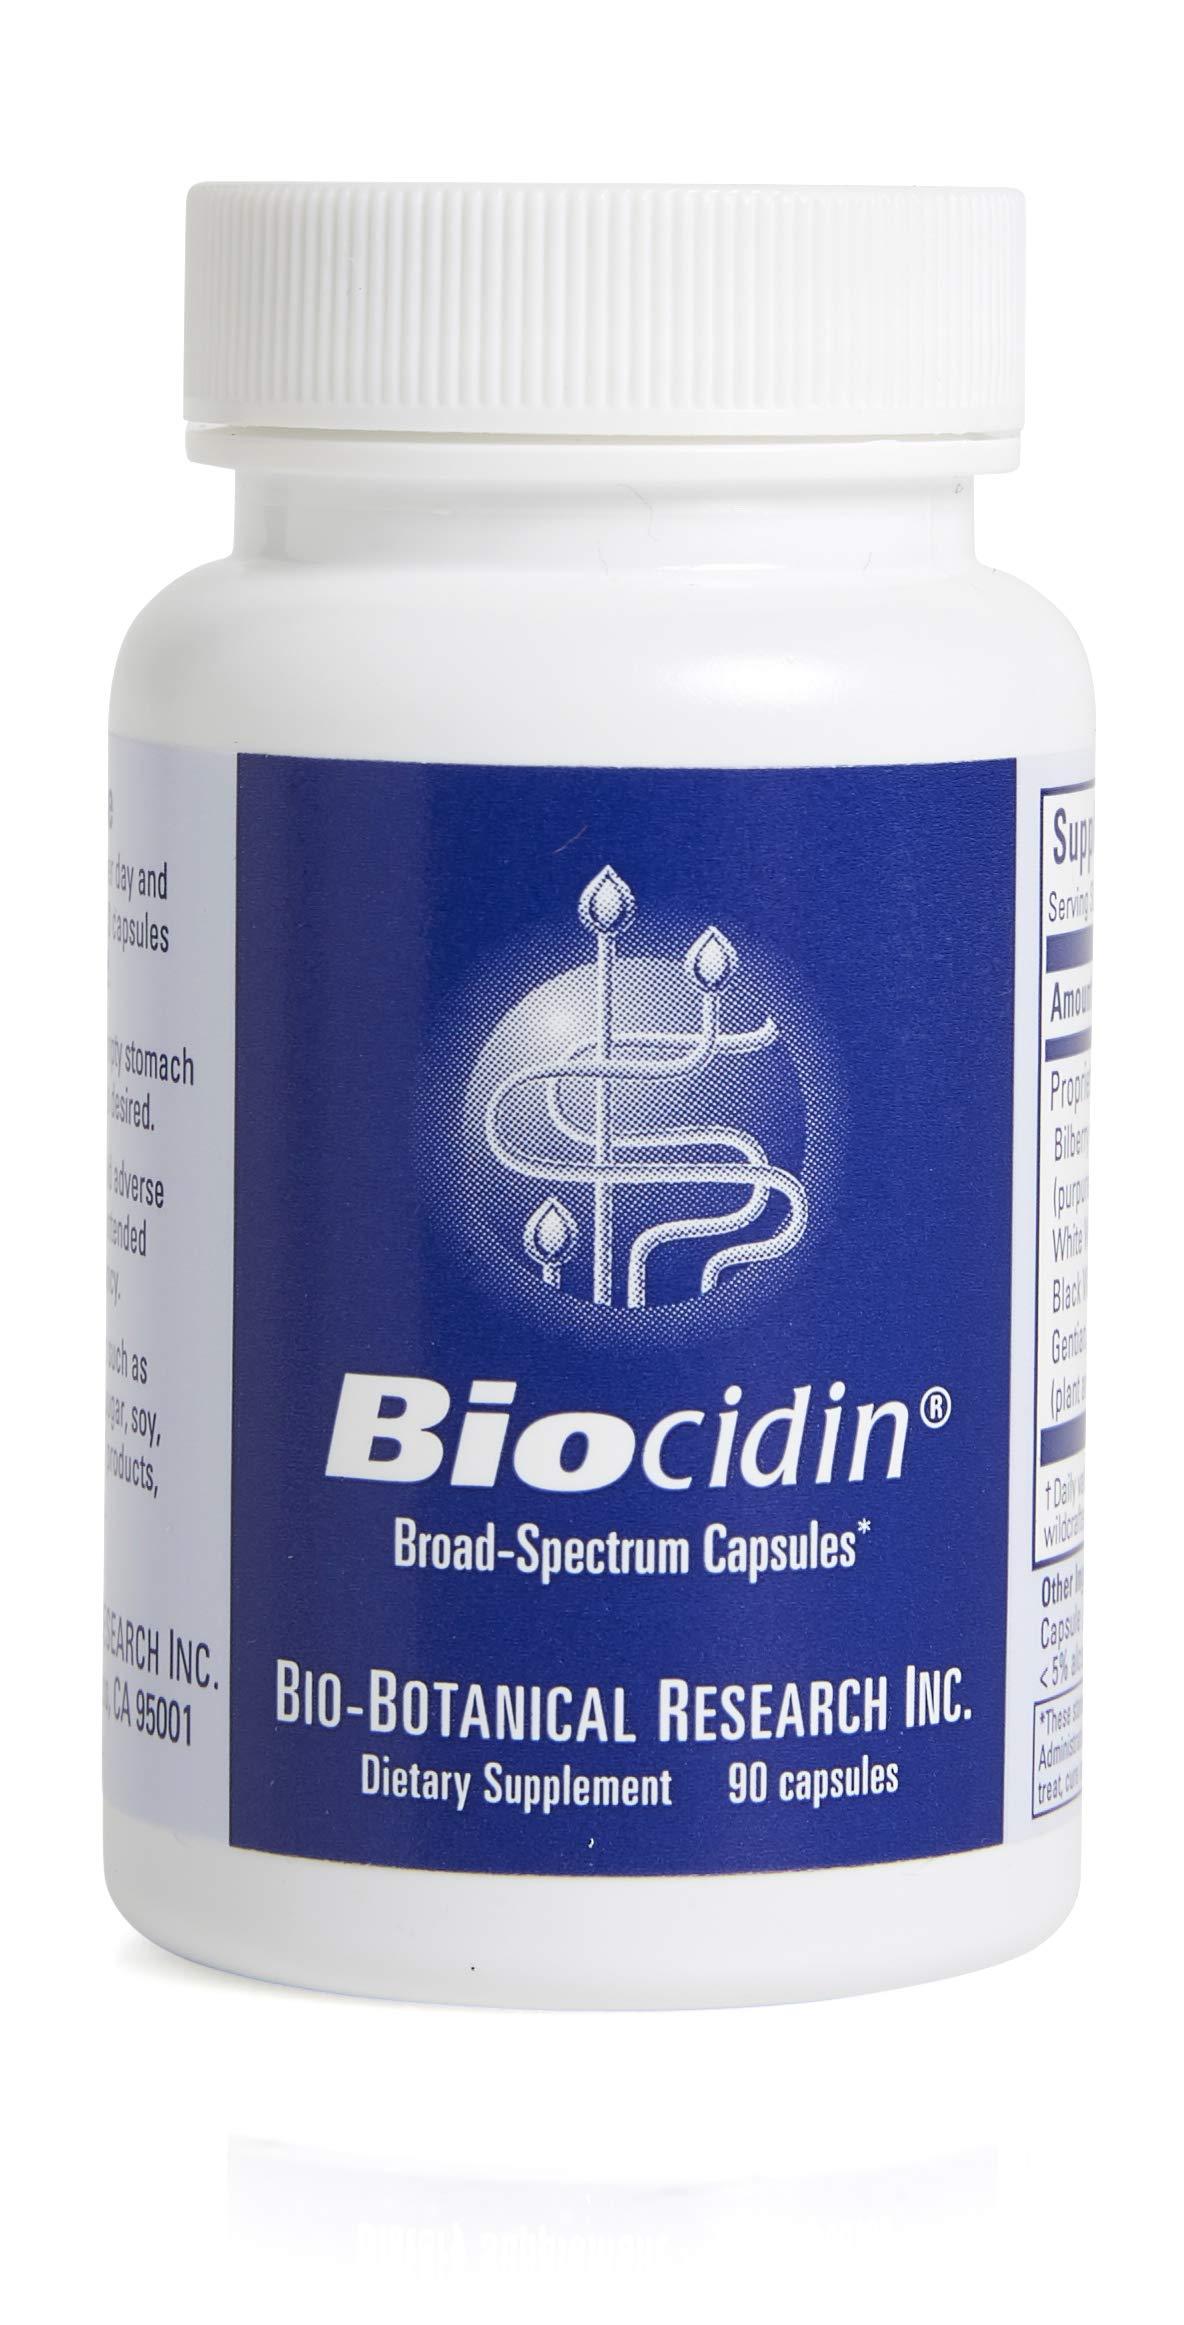 Bio Botanical Research Biocidin Capsules 90ct